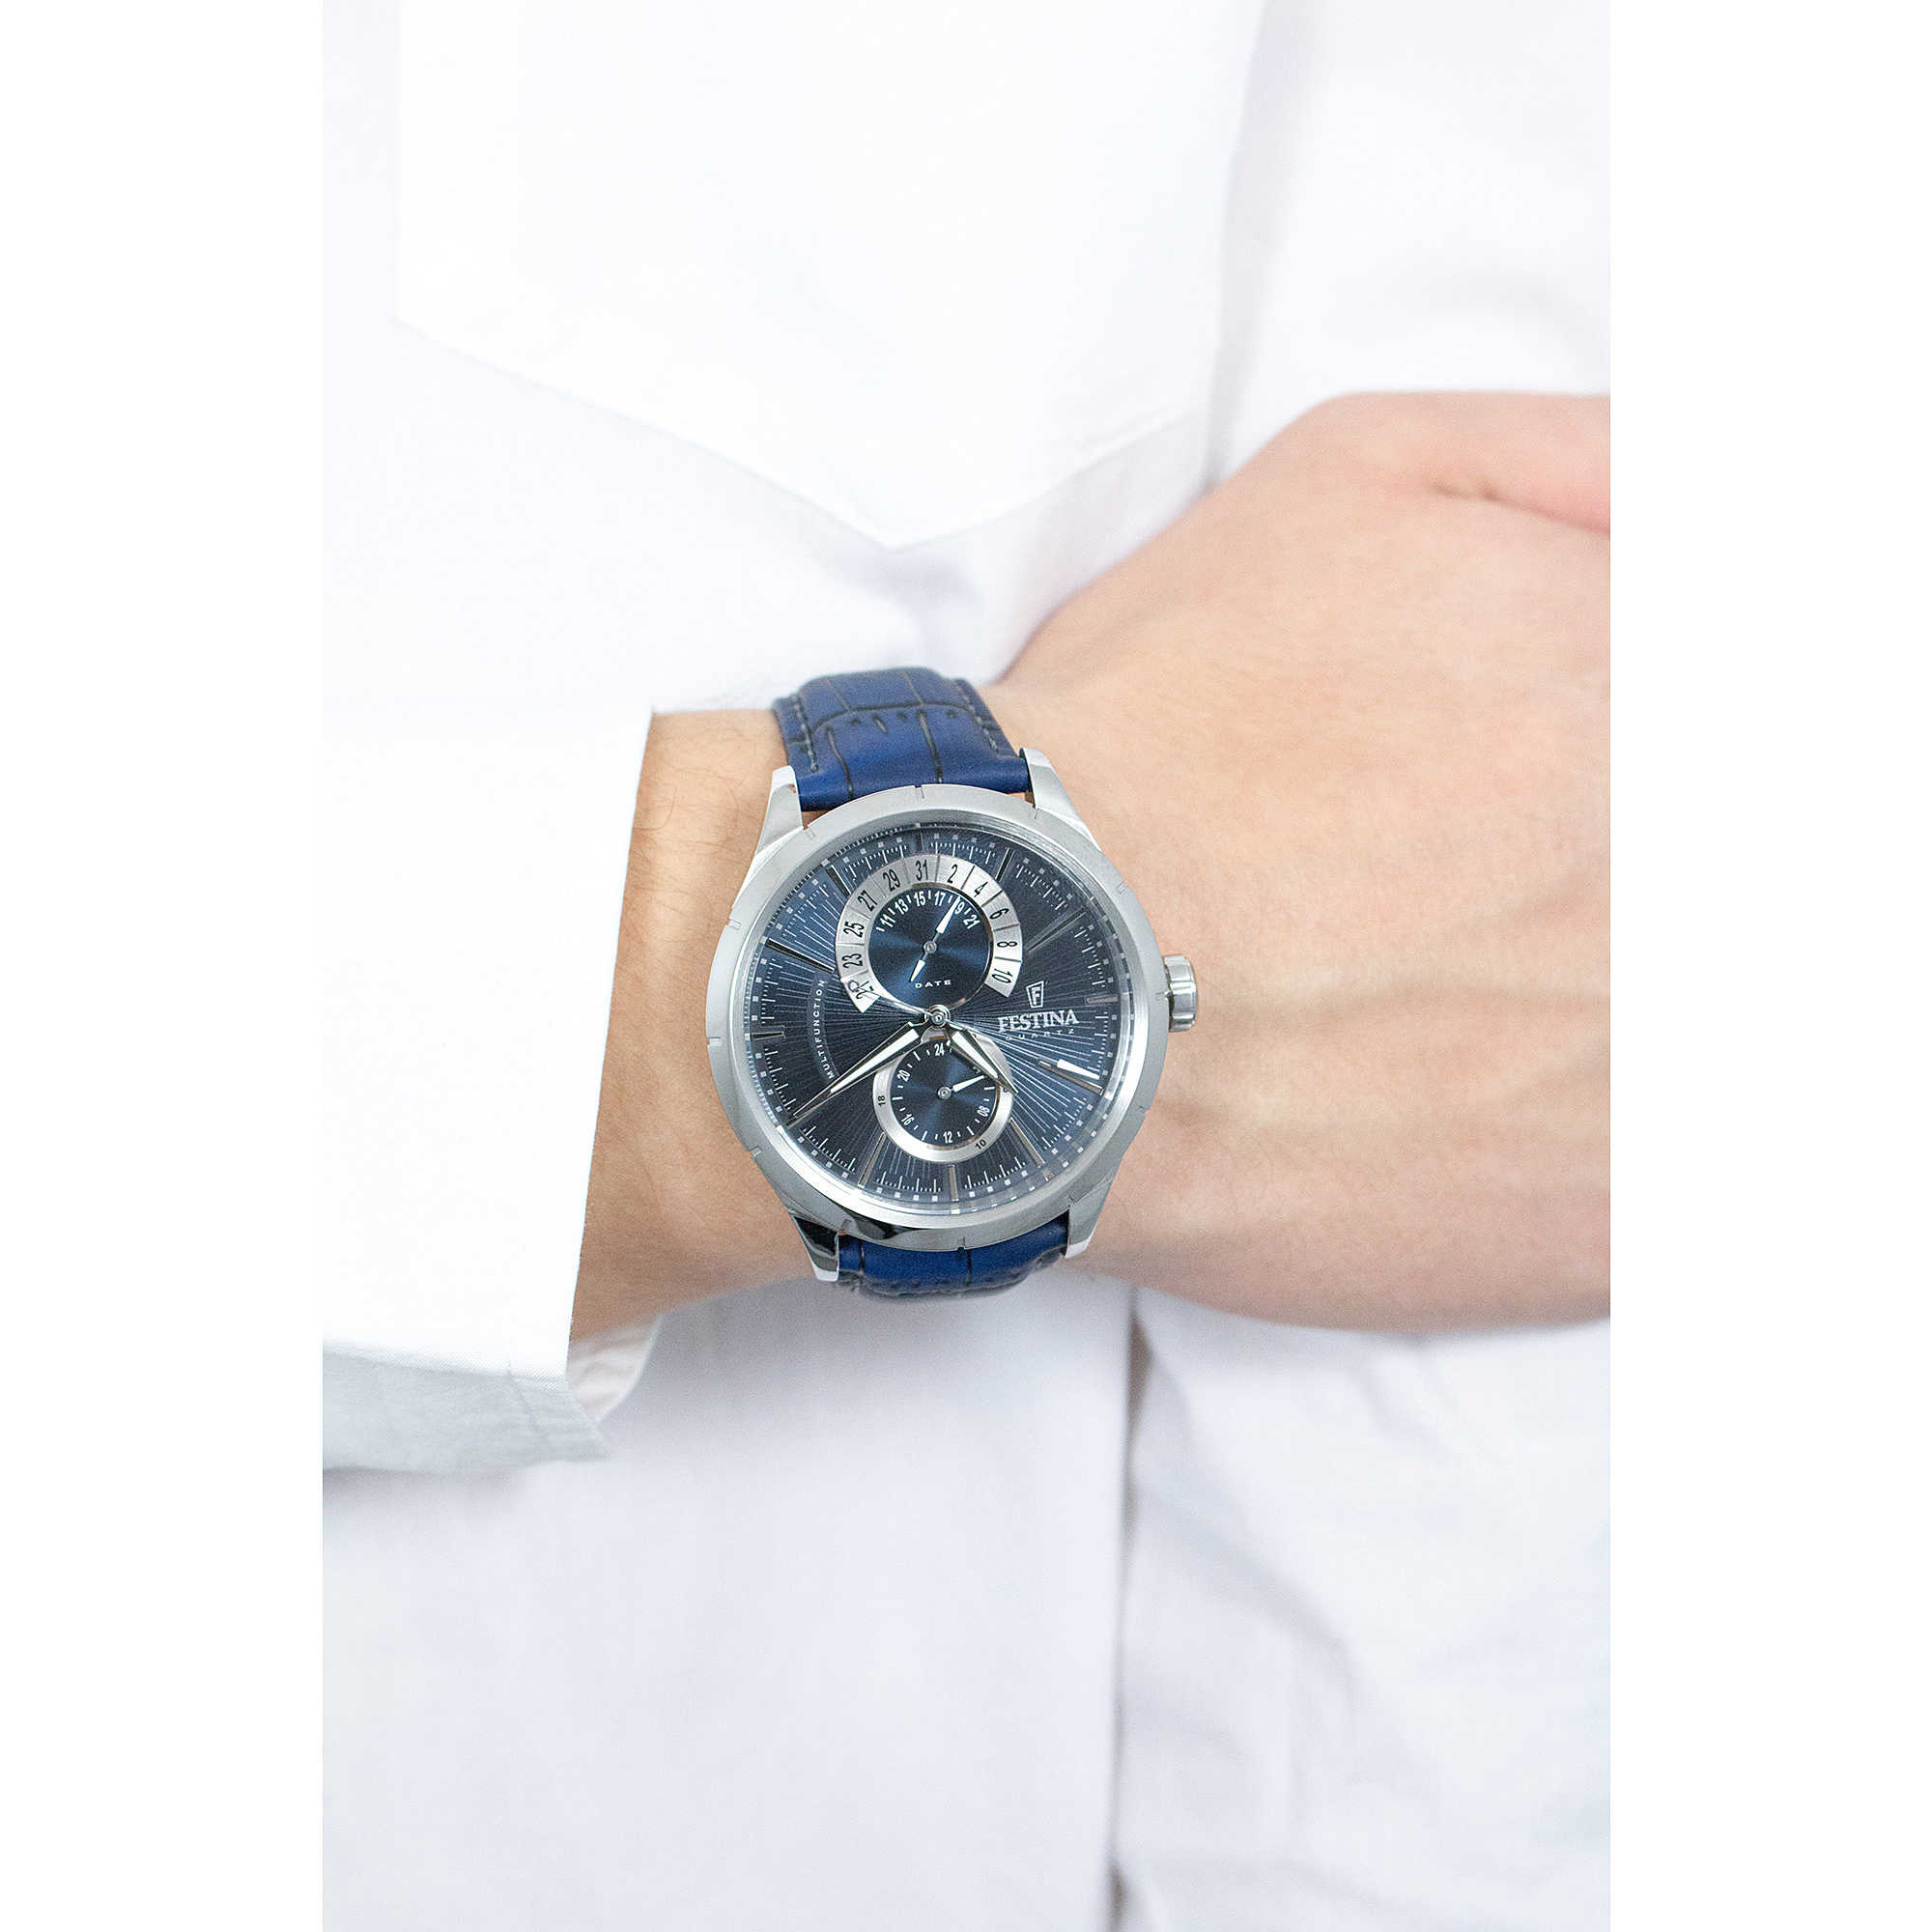 da9fd36be7b watch multifunction man Festina Retro F16573 A multifunction Festina